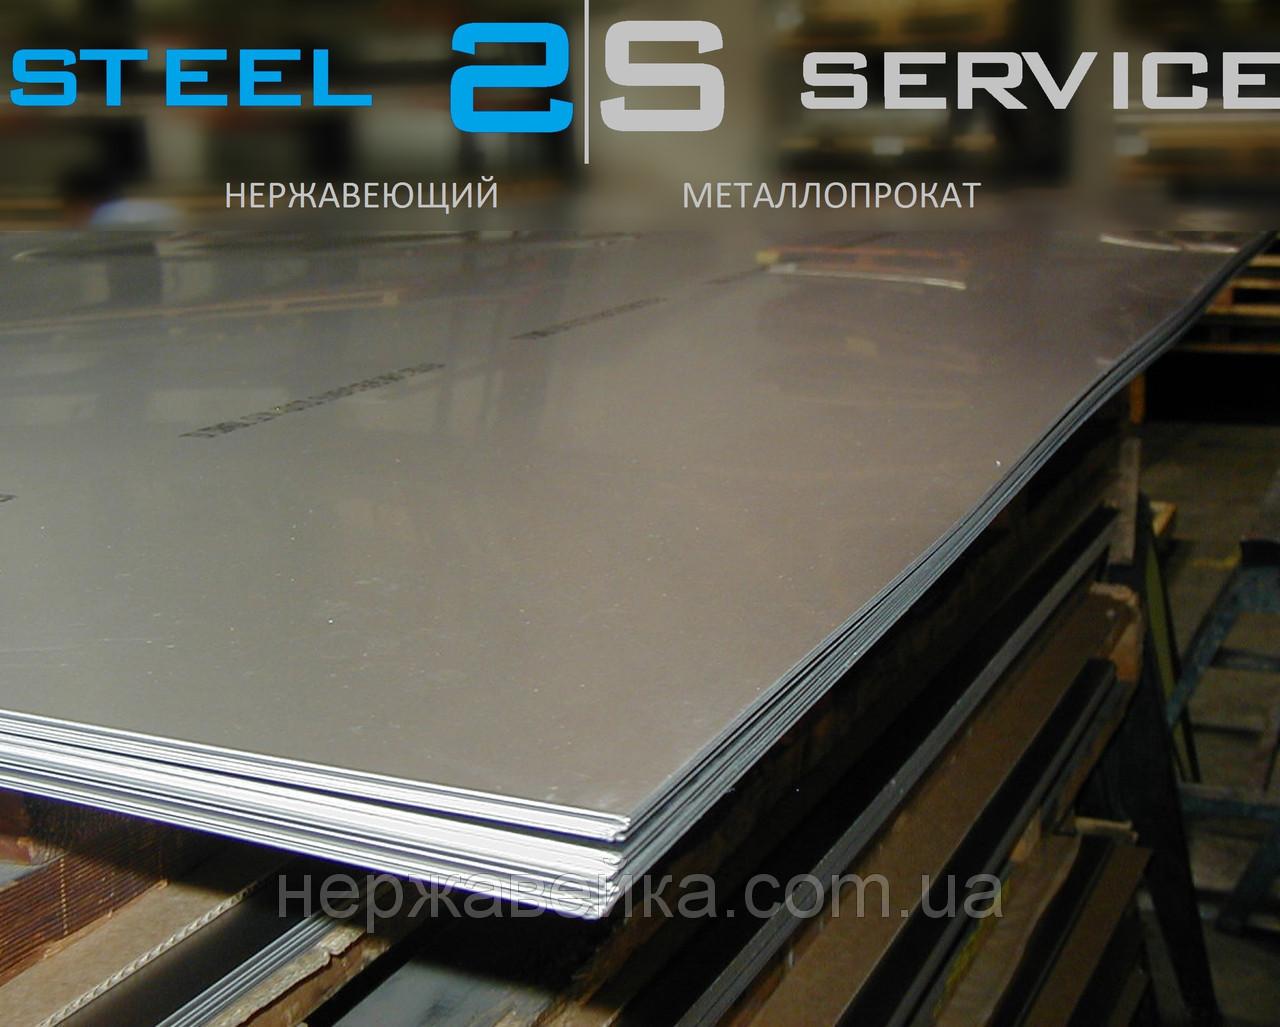 Нержавеющий лист 10х1000х2000мм AISI 430(12Х17) 2B - матовый, технический